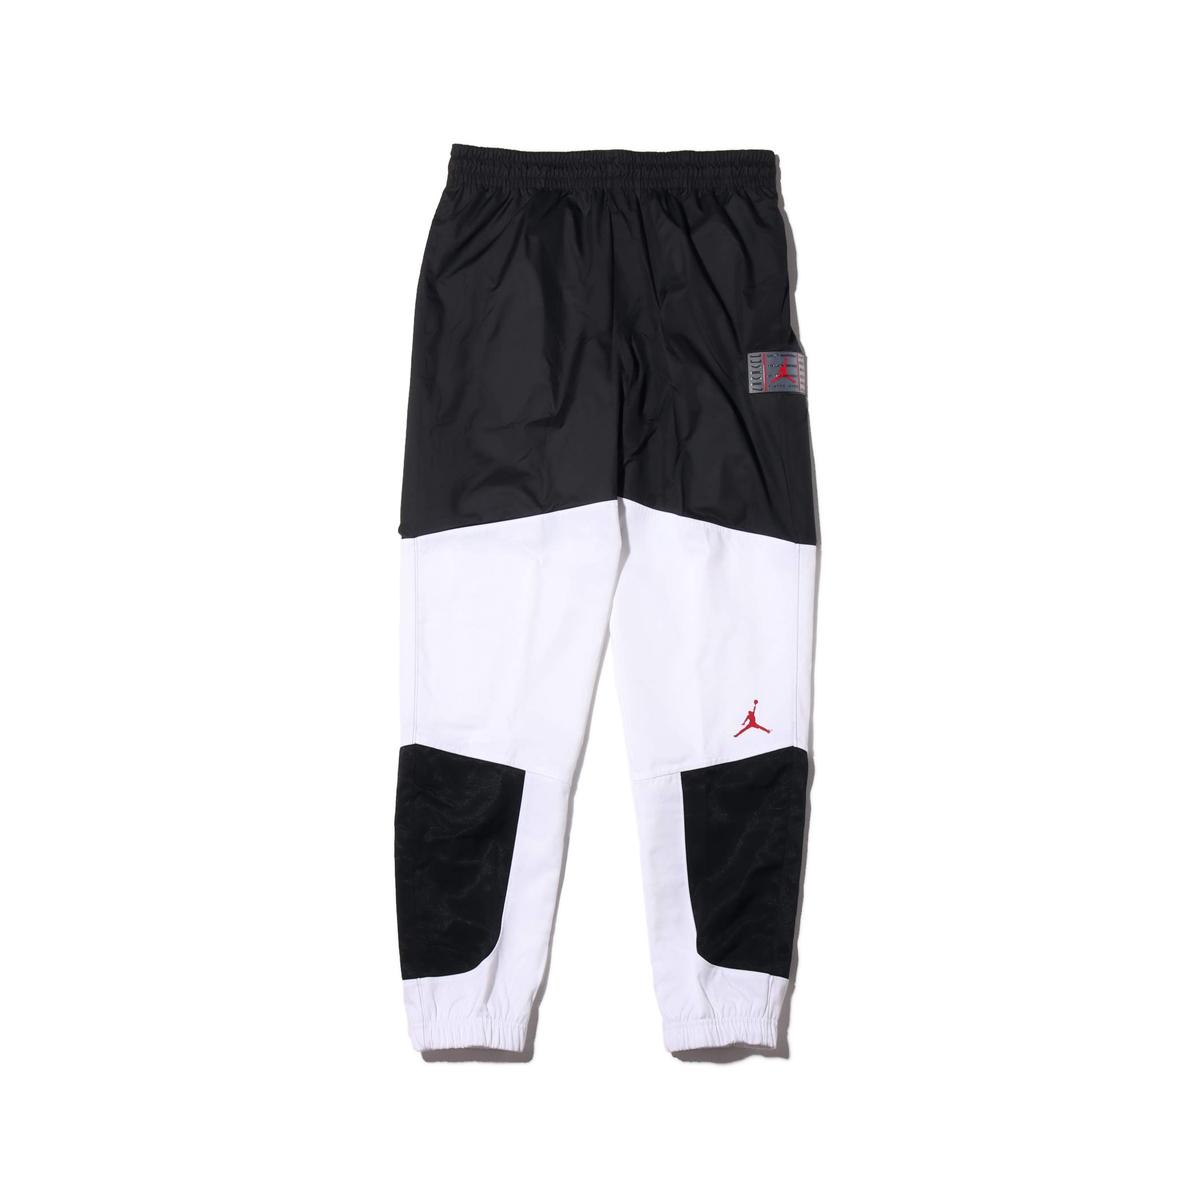 NIKE M J LGC AJ11 CLRBLK PANT(ナイキ ジョーダン レガシー AJ11 クリアブラック パンツ)BLACK/WHITE/GYM RED【メンズ ロングパンツ】19HO-S